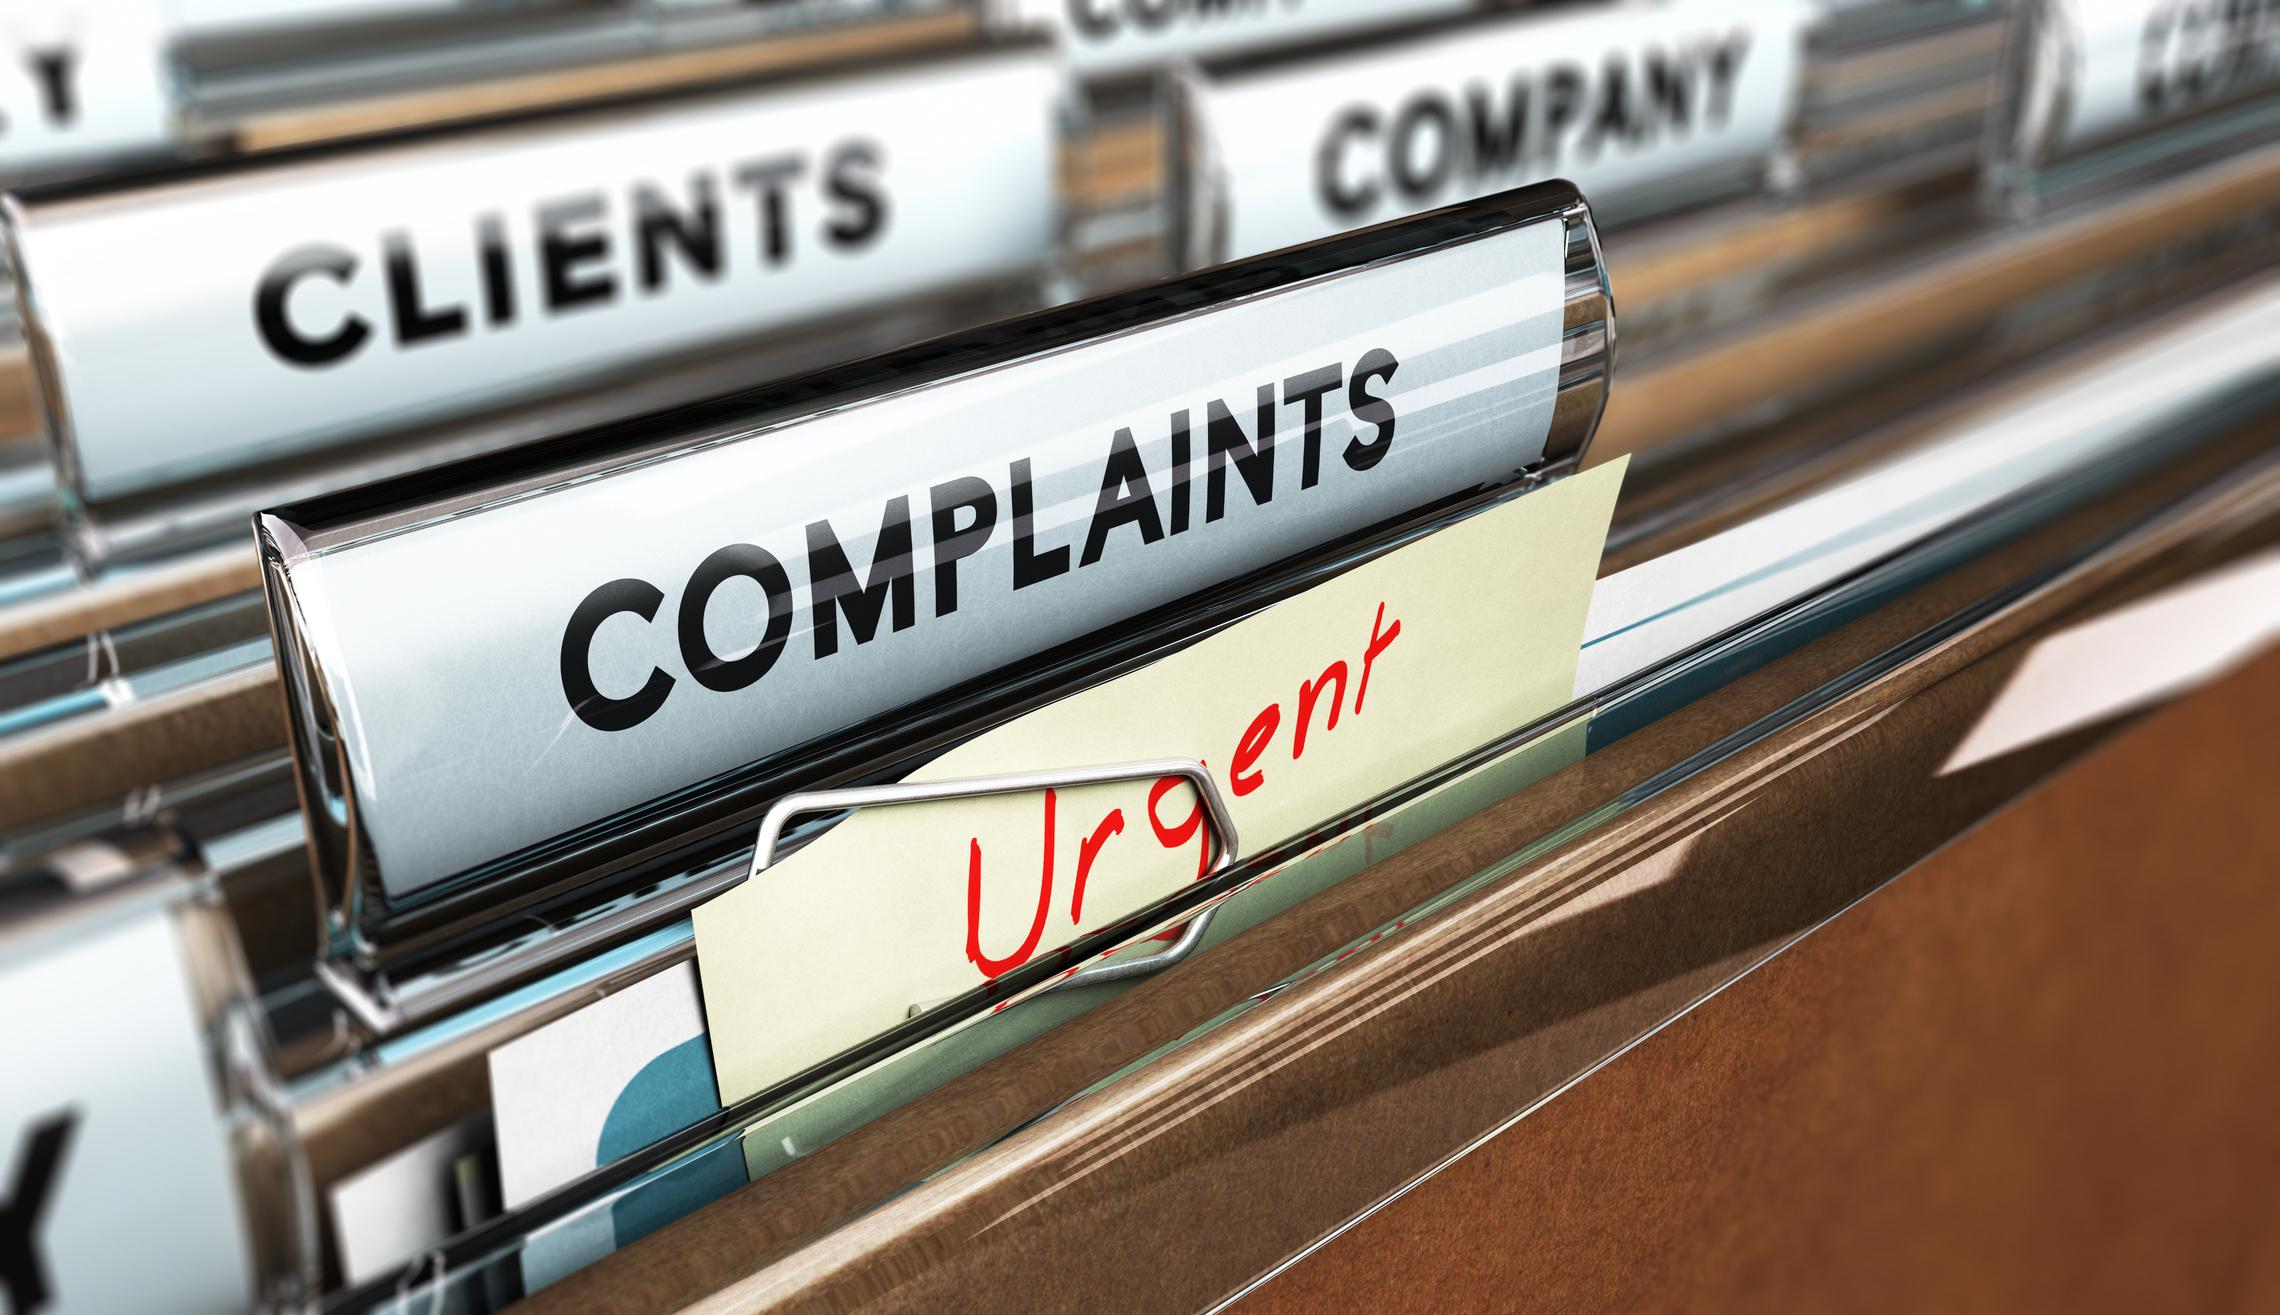 tenant-complaints-how-to-handle-them-property-management.jpg